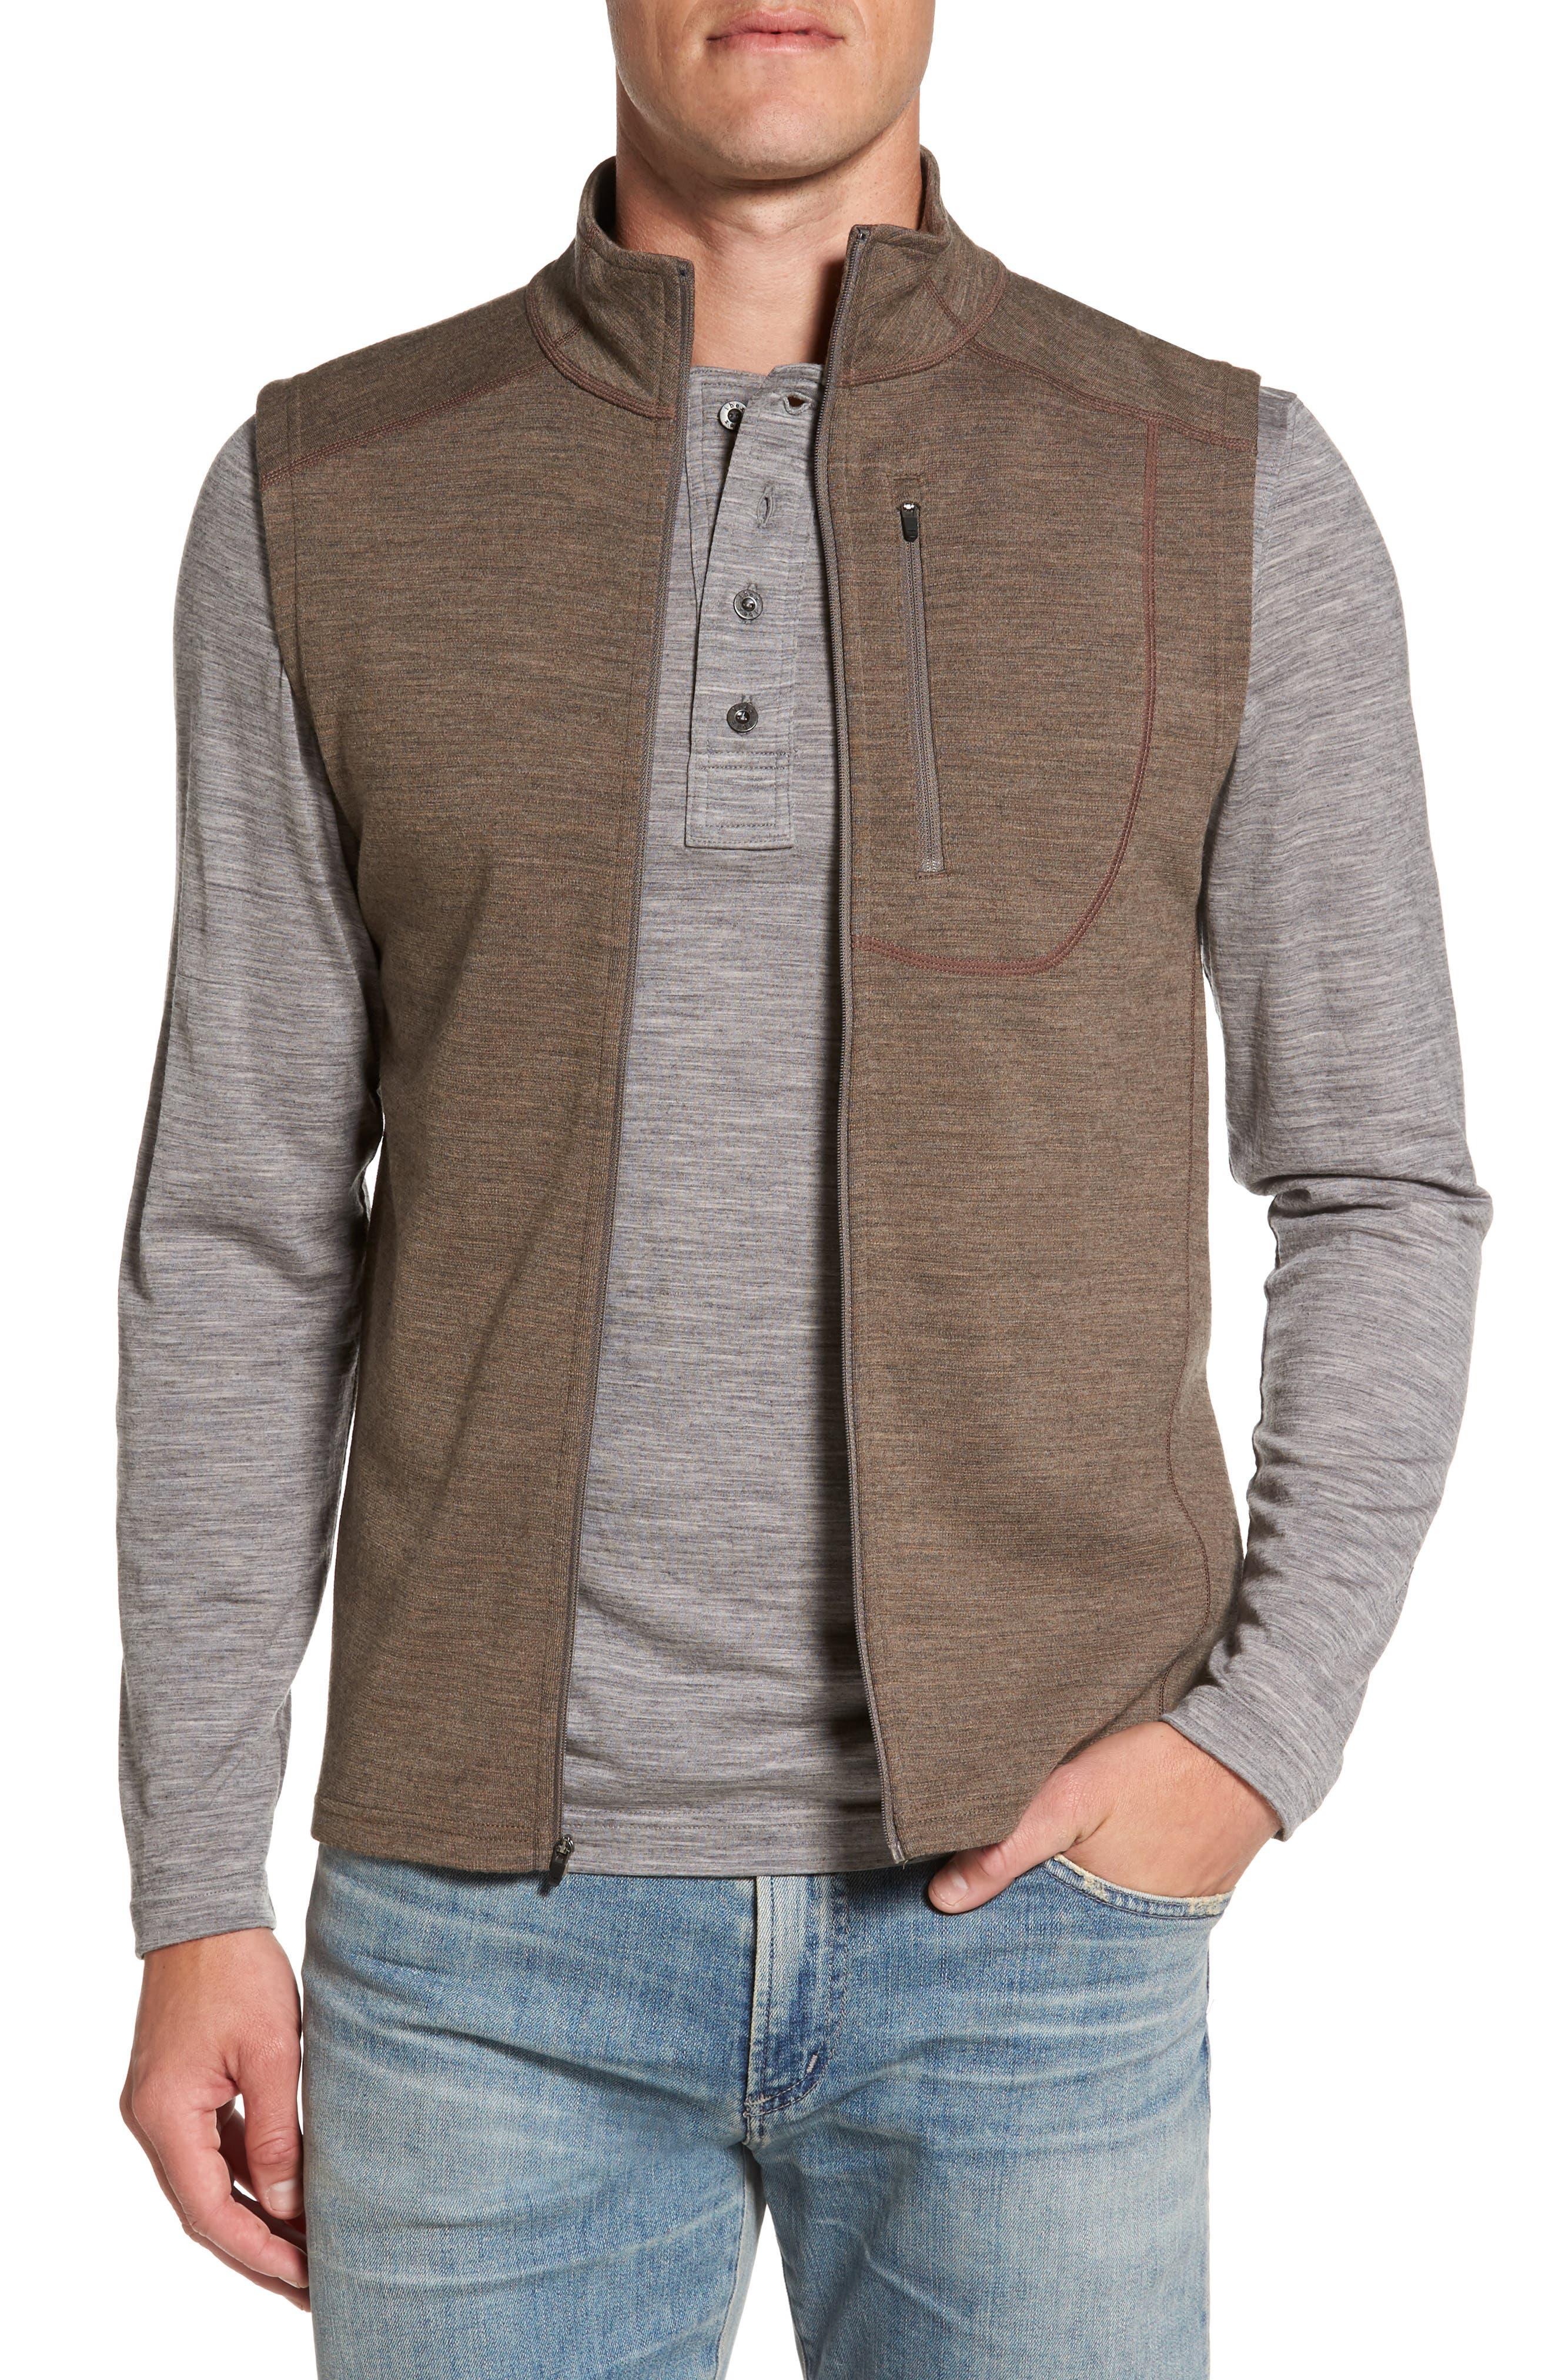 'Shak' Merino Wool Vest,                             Main thumbnail 1, color,                             250